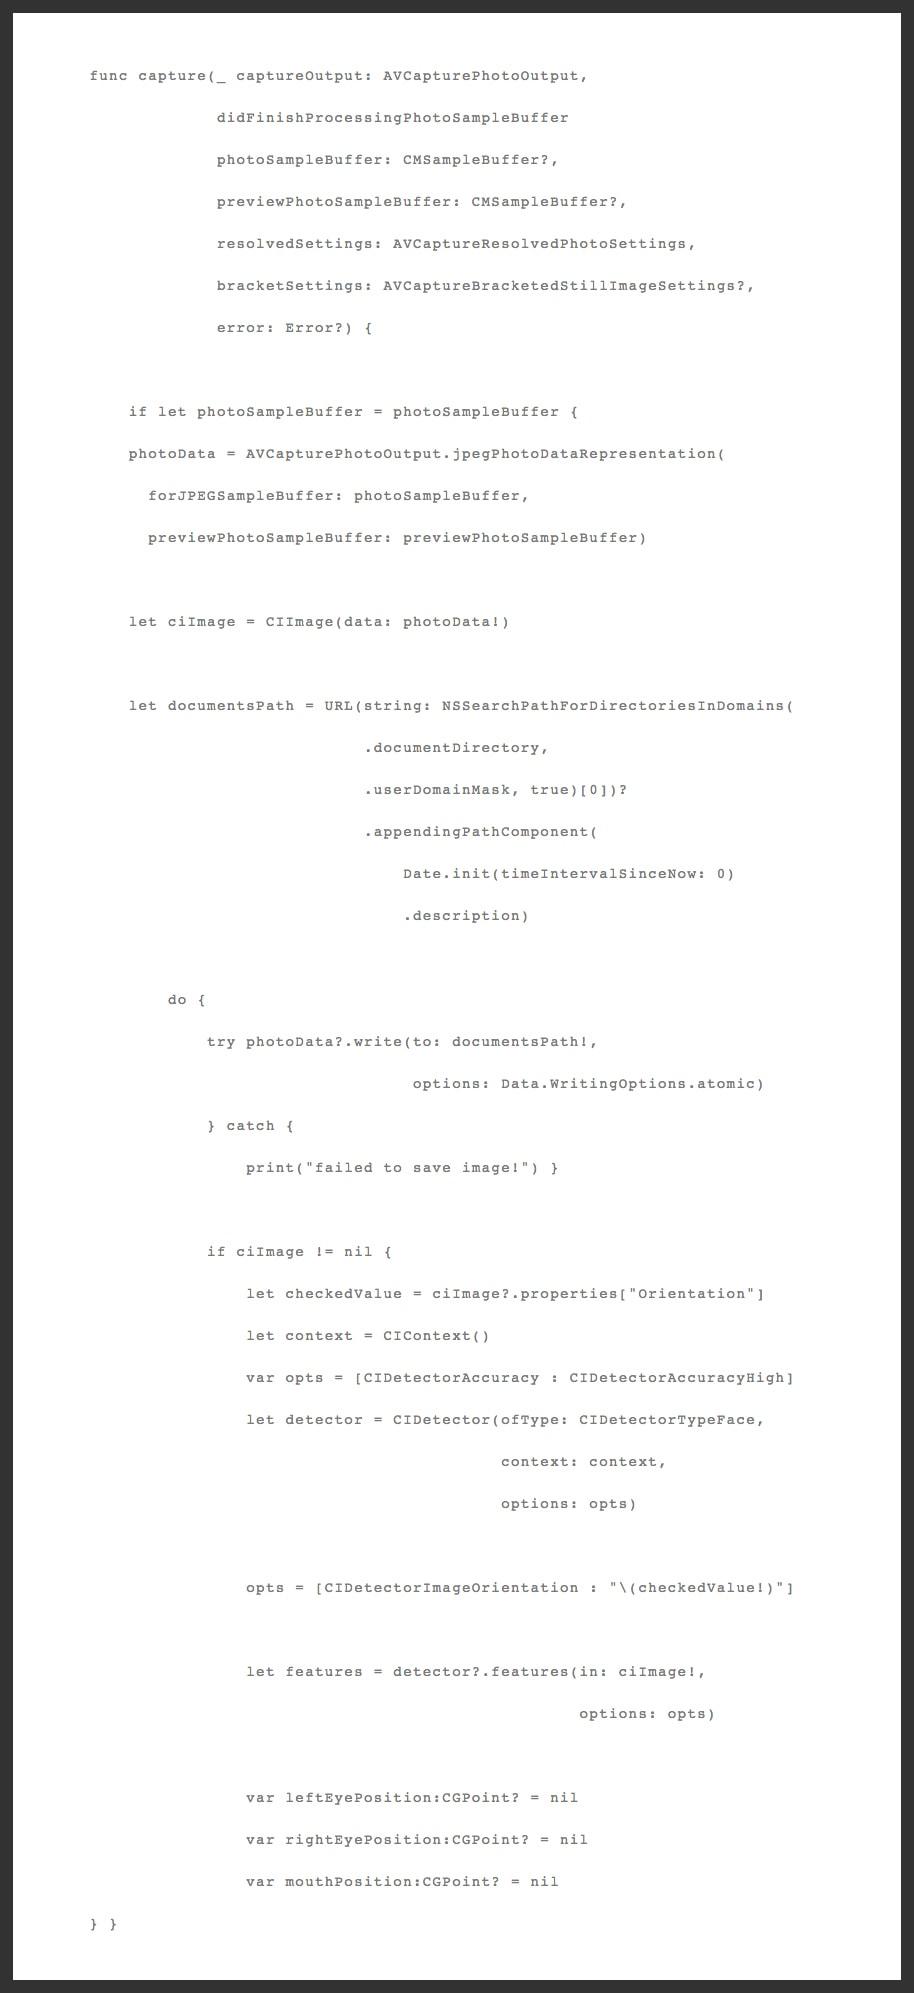 Ansigtsgenkendelse-til-Virtuel-Receptionist---Touchlogic_kode.jpg